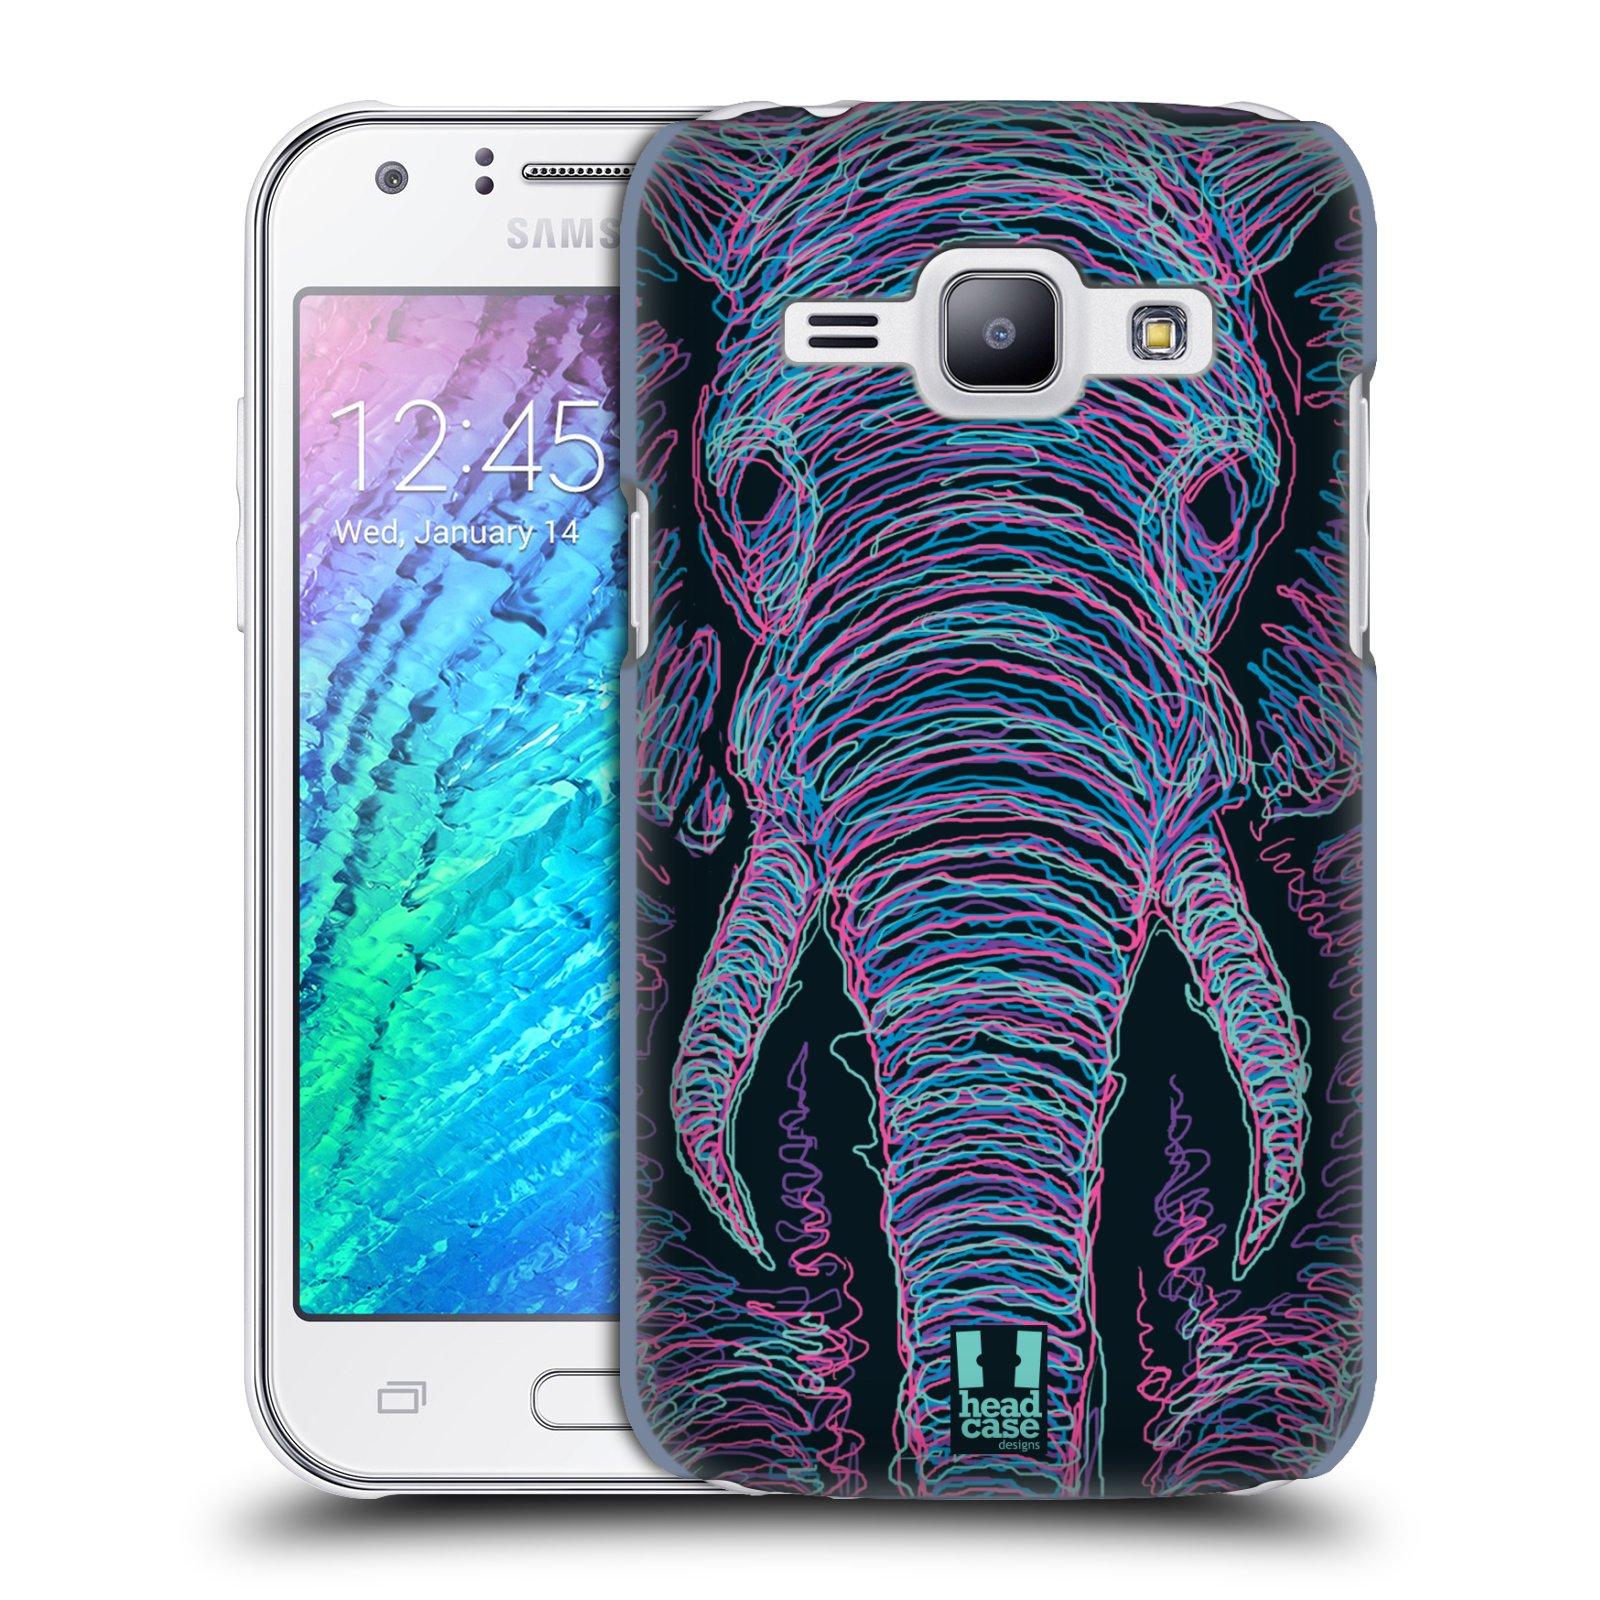 HEAD CASE plastový obal na mobil SAMSUNG Galaxy J1, J100 vzor zvíře čmáranice slon